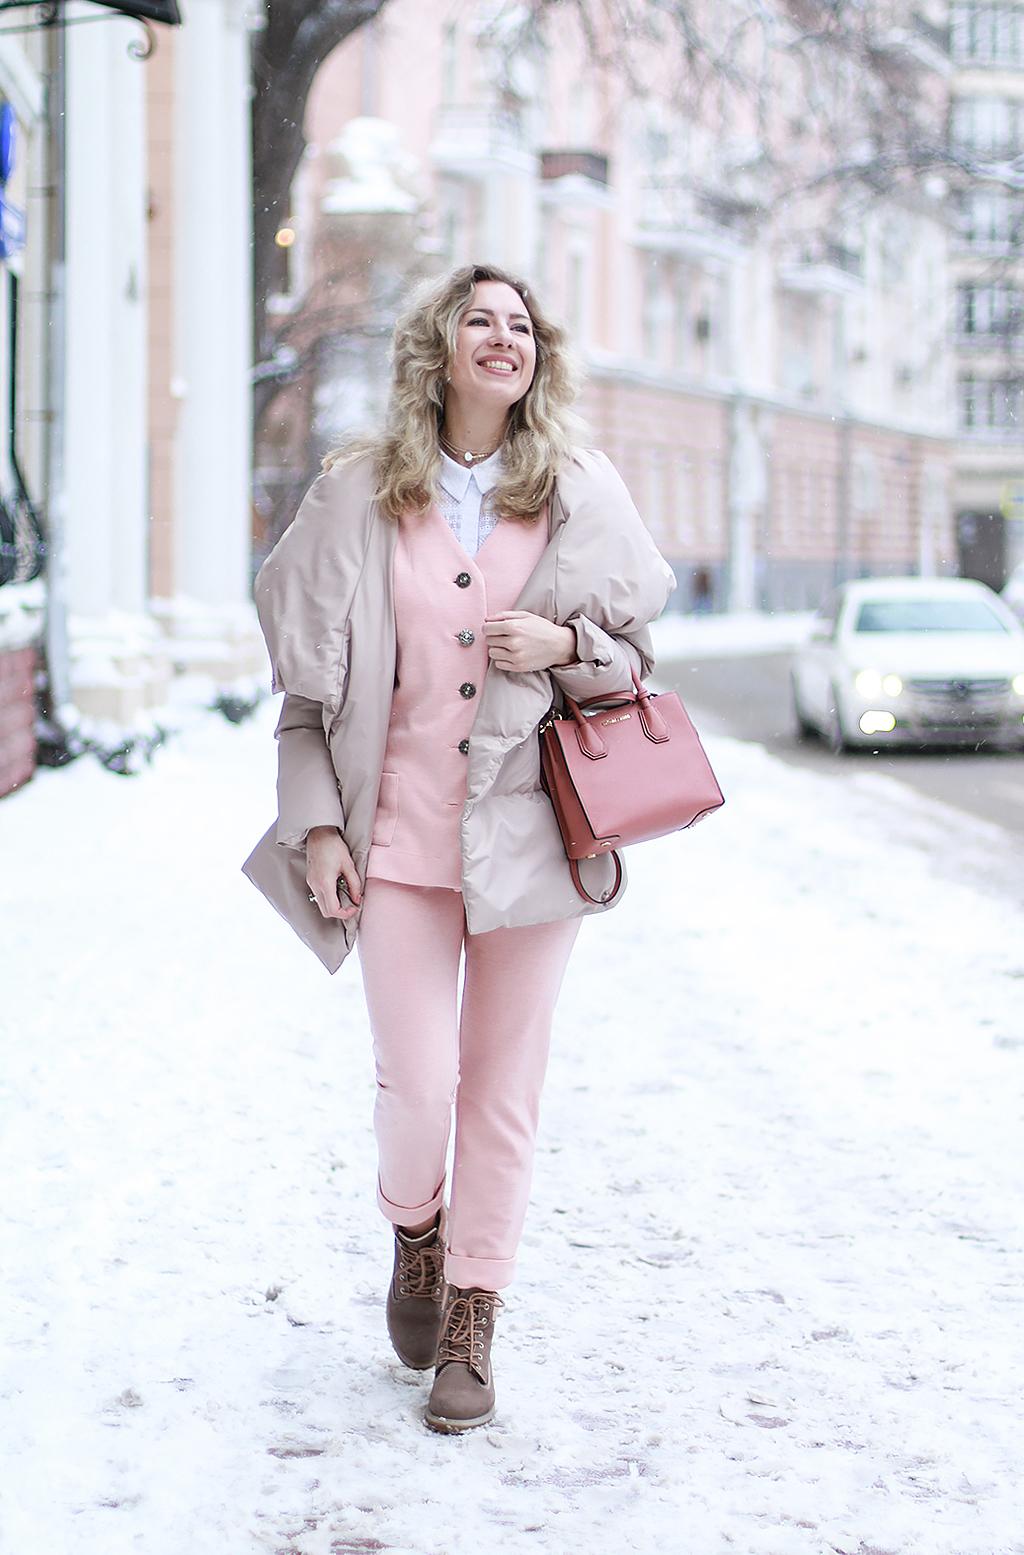 Margarita_Maslova_Ritalifestyle_Fashion_blogger_Moscow_Romantic_style_sport_chic_Pastel_looks_puffy_jacket